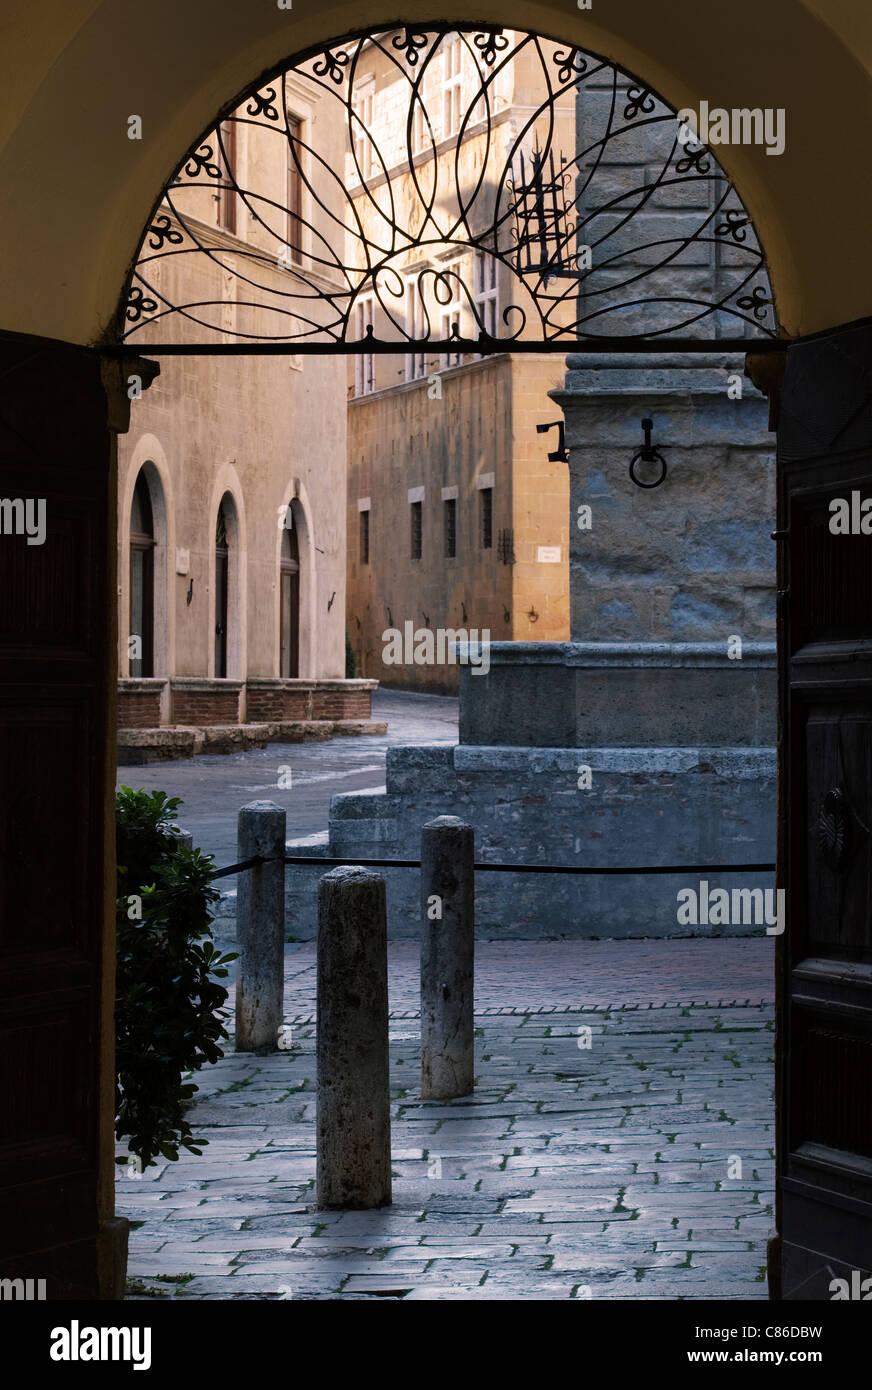 Street Scene - Pienza, Toscana - puerta temprano en la mañana. Imagen De Stock